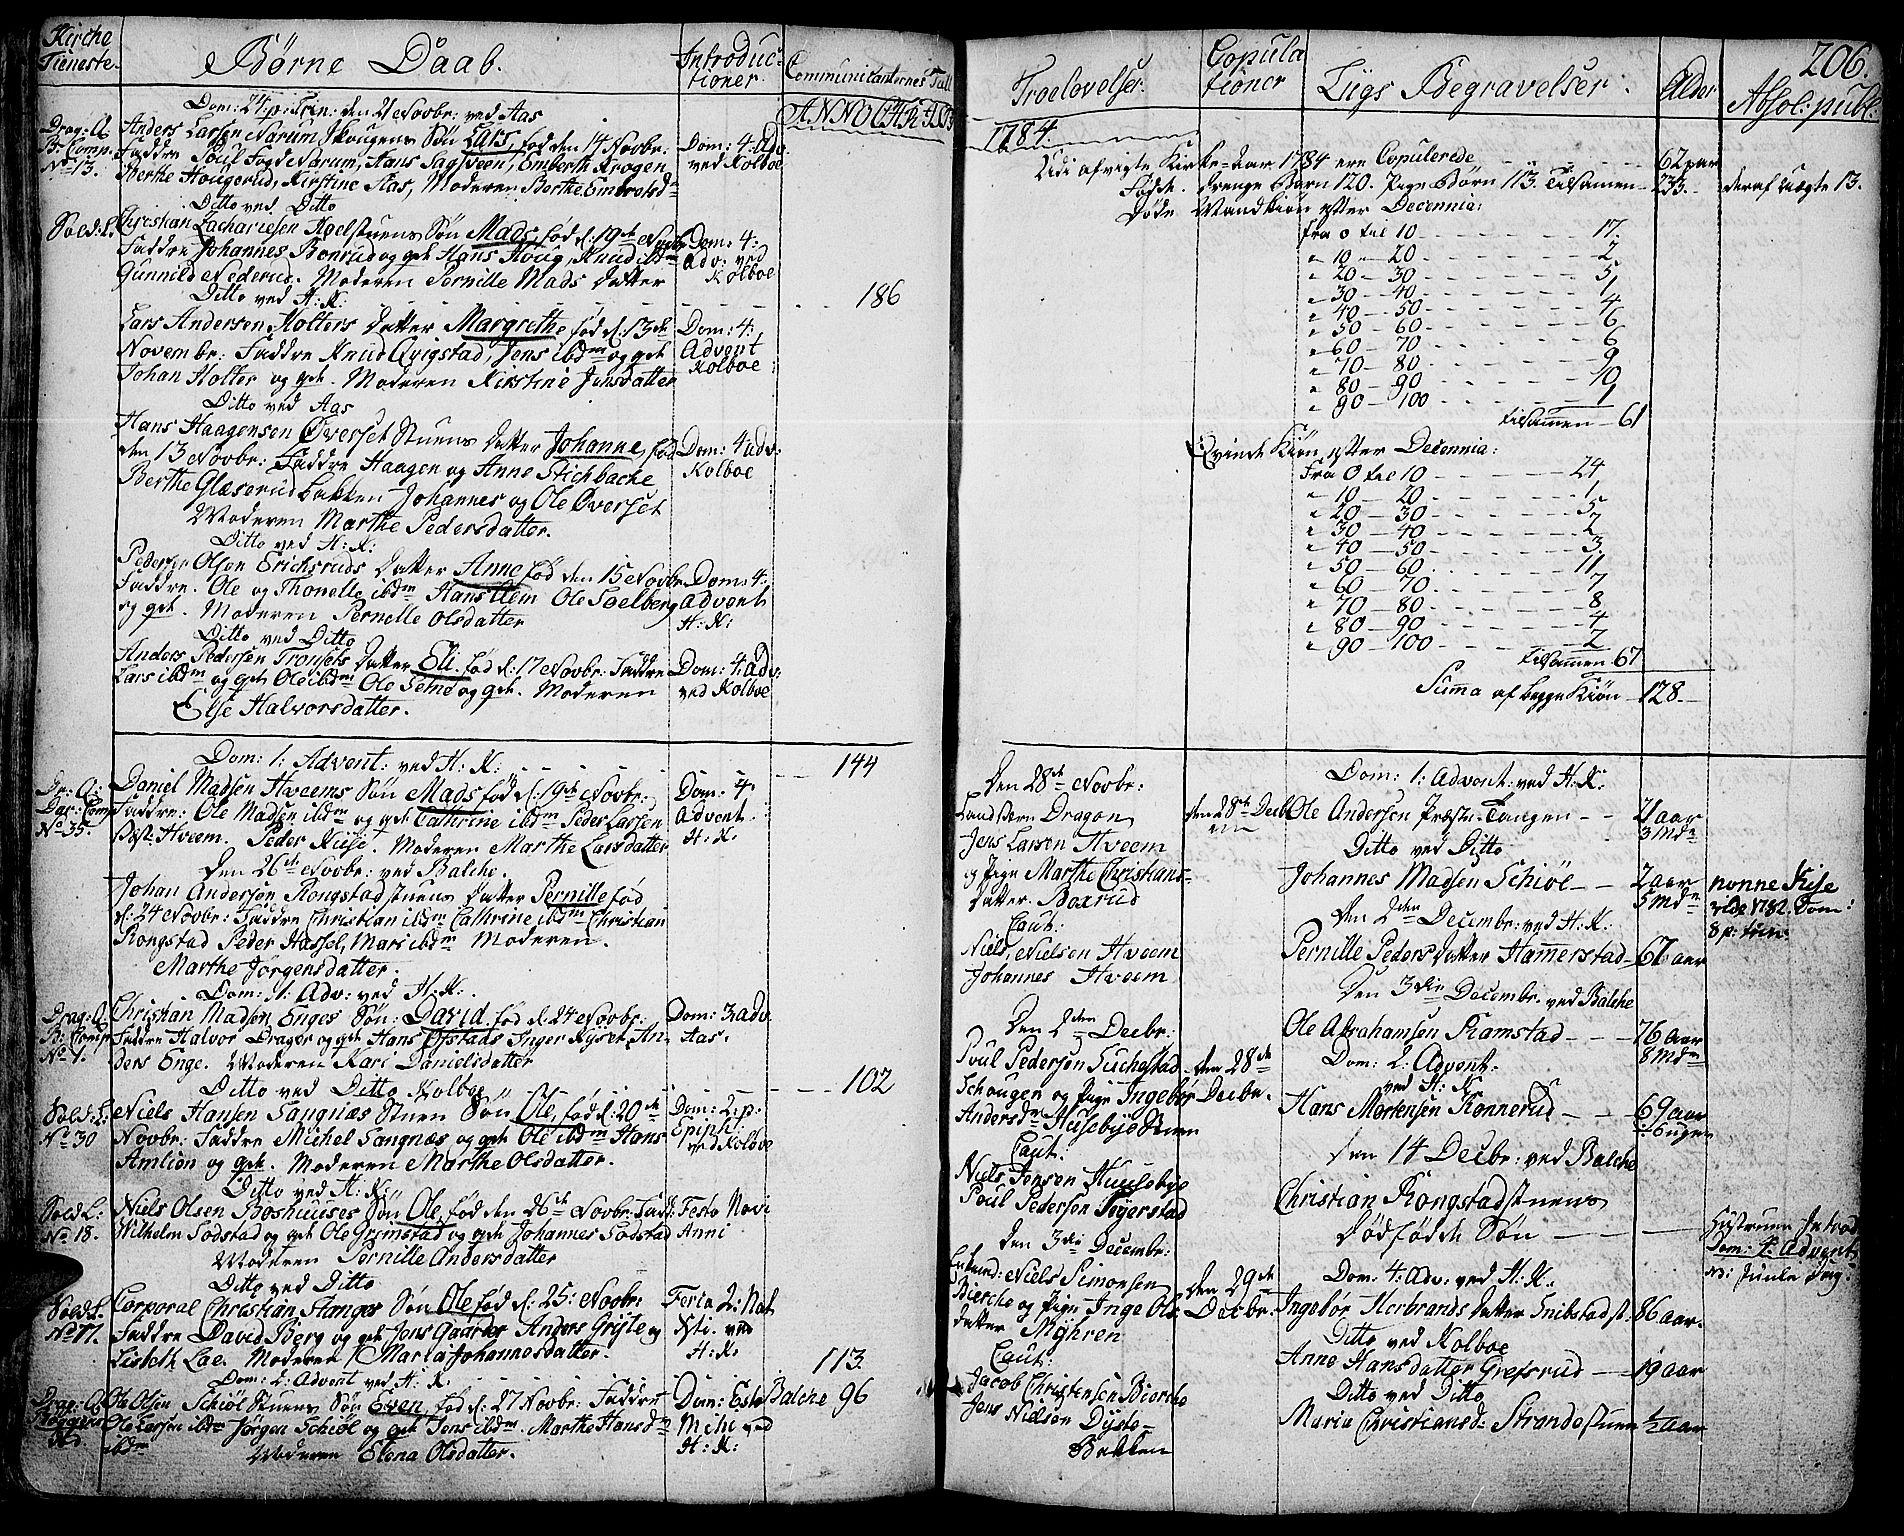 SAH, Toten prestekontor, Ministerialbok nr. 6, 1773-1793, s. 206